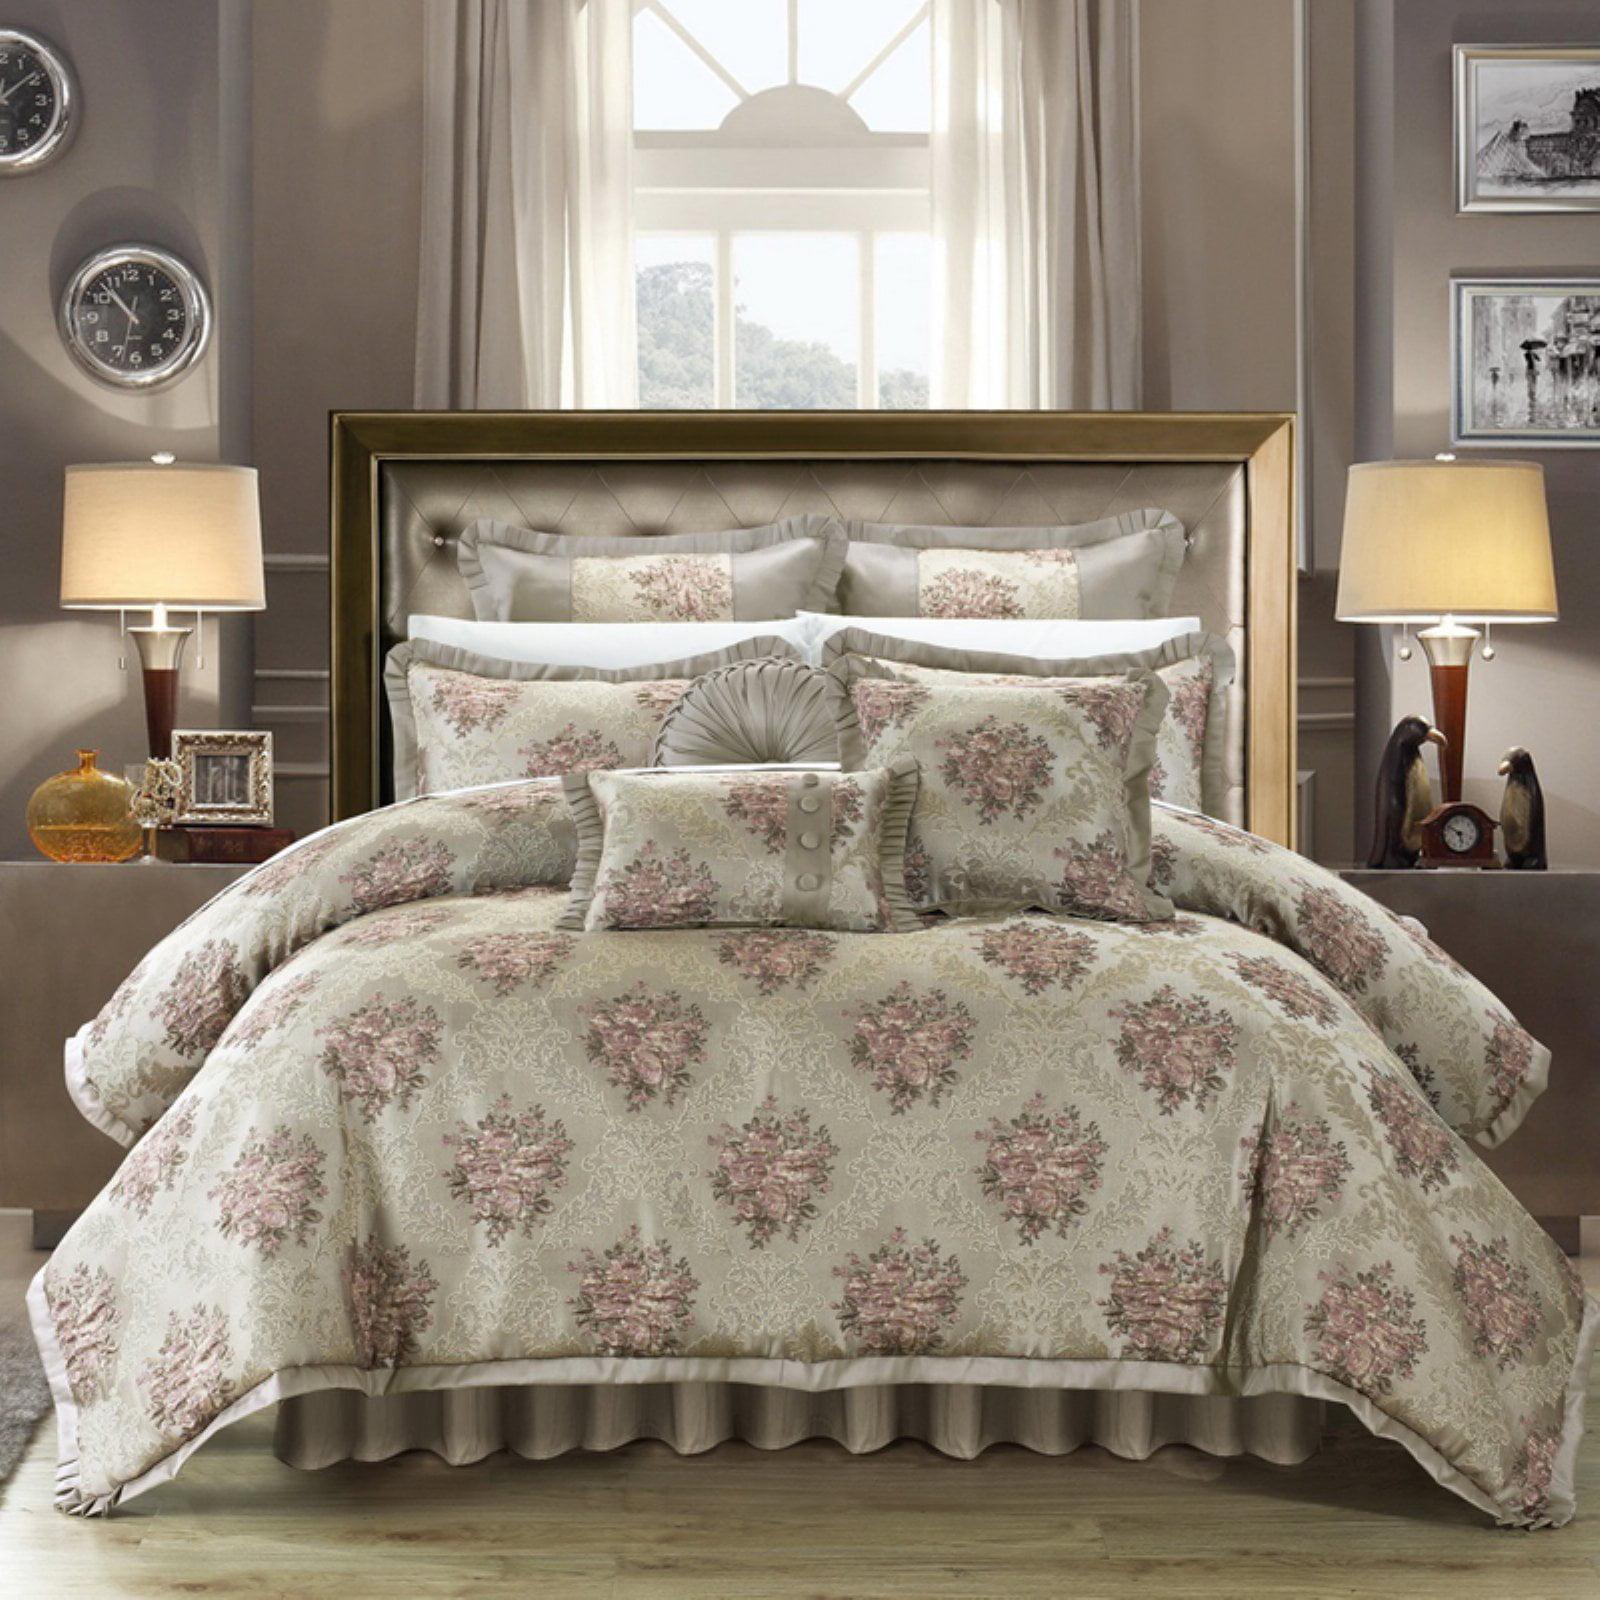 9 Piece Zanotti Decorator Upholstery Quality Jacquard Floral Fabric Complete Master Bedroom Comforter Set Walmart Com Walmart Com